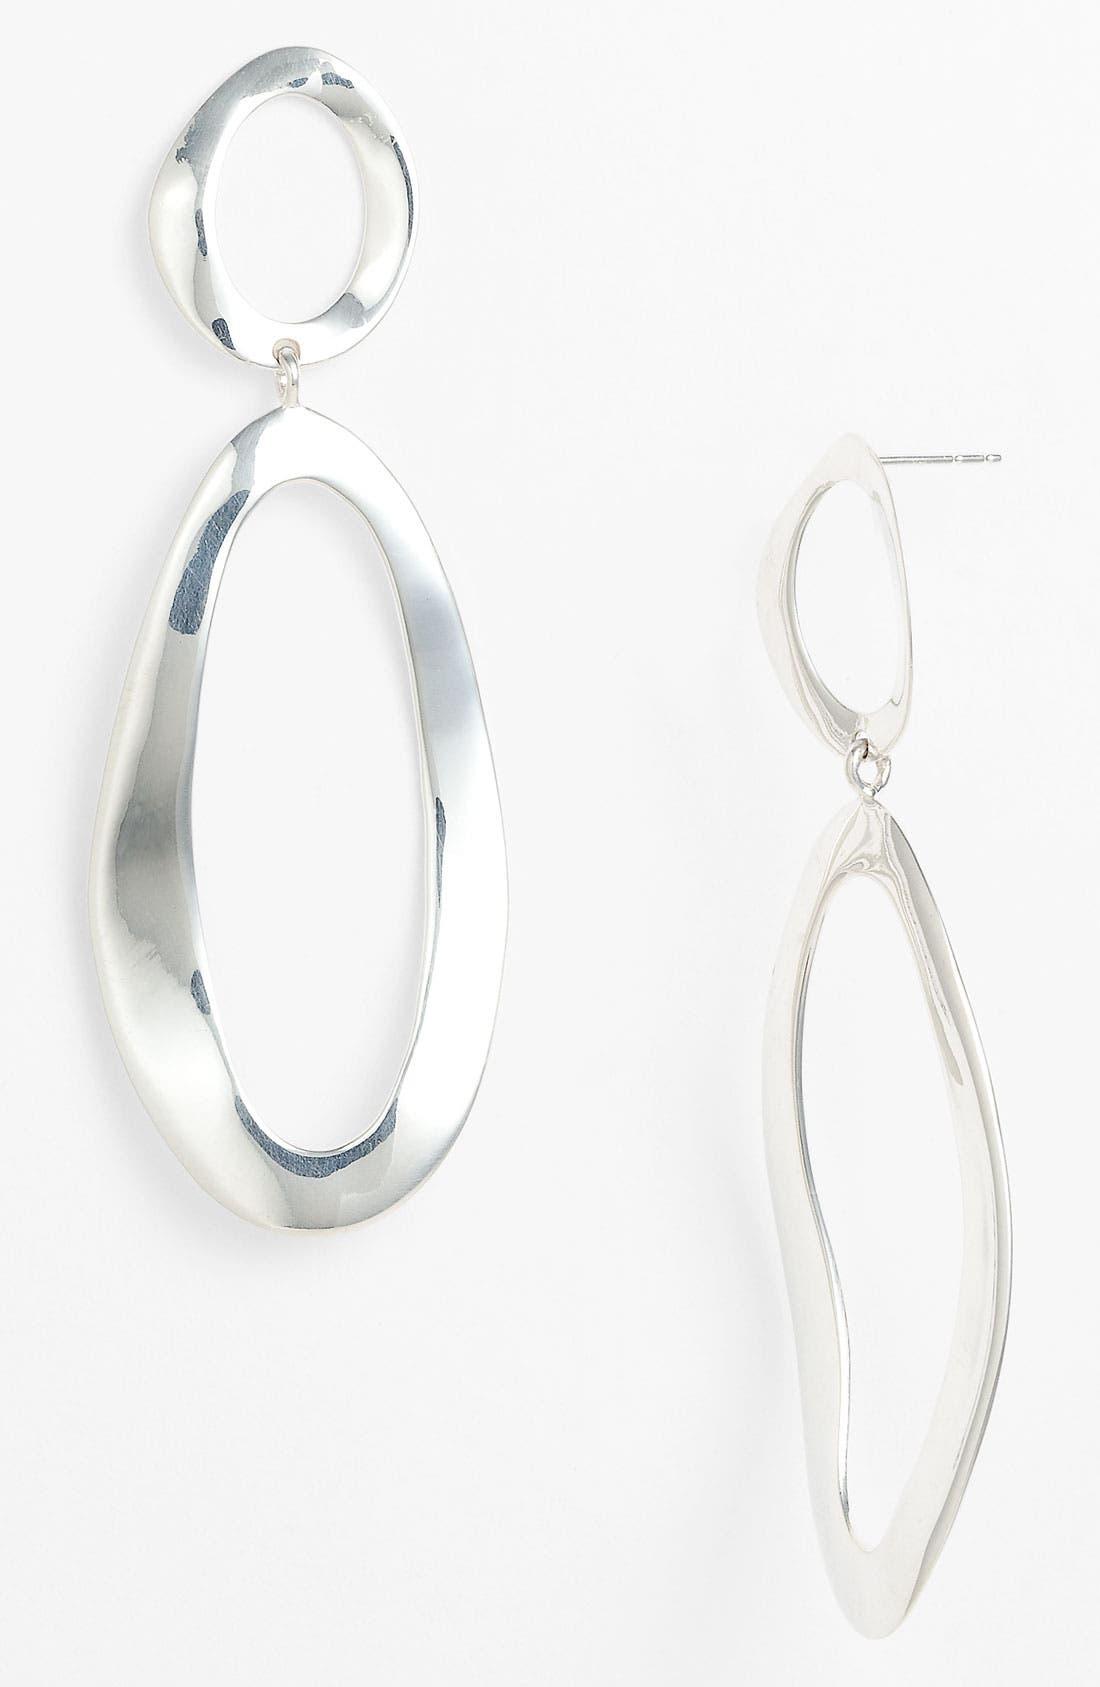 'Oval Snowman' Large Wavy Earrings,                             Main thumbnail 1, color,                             Silver